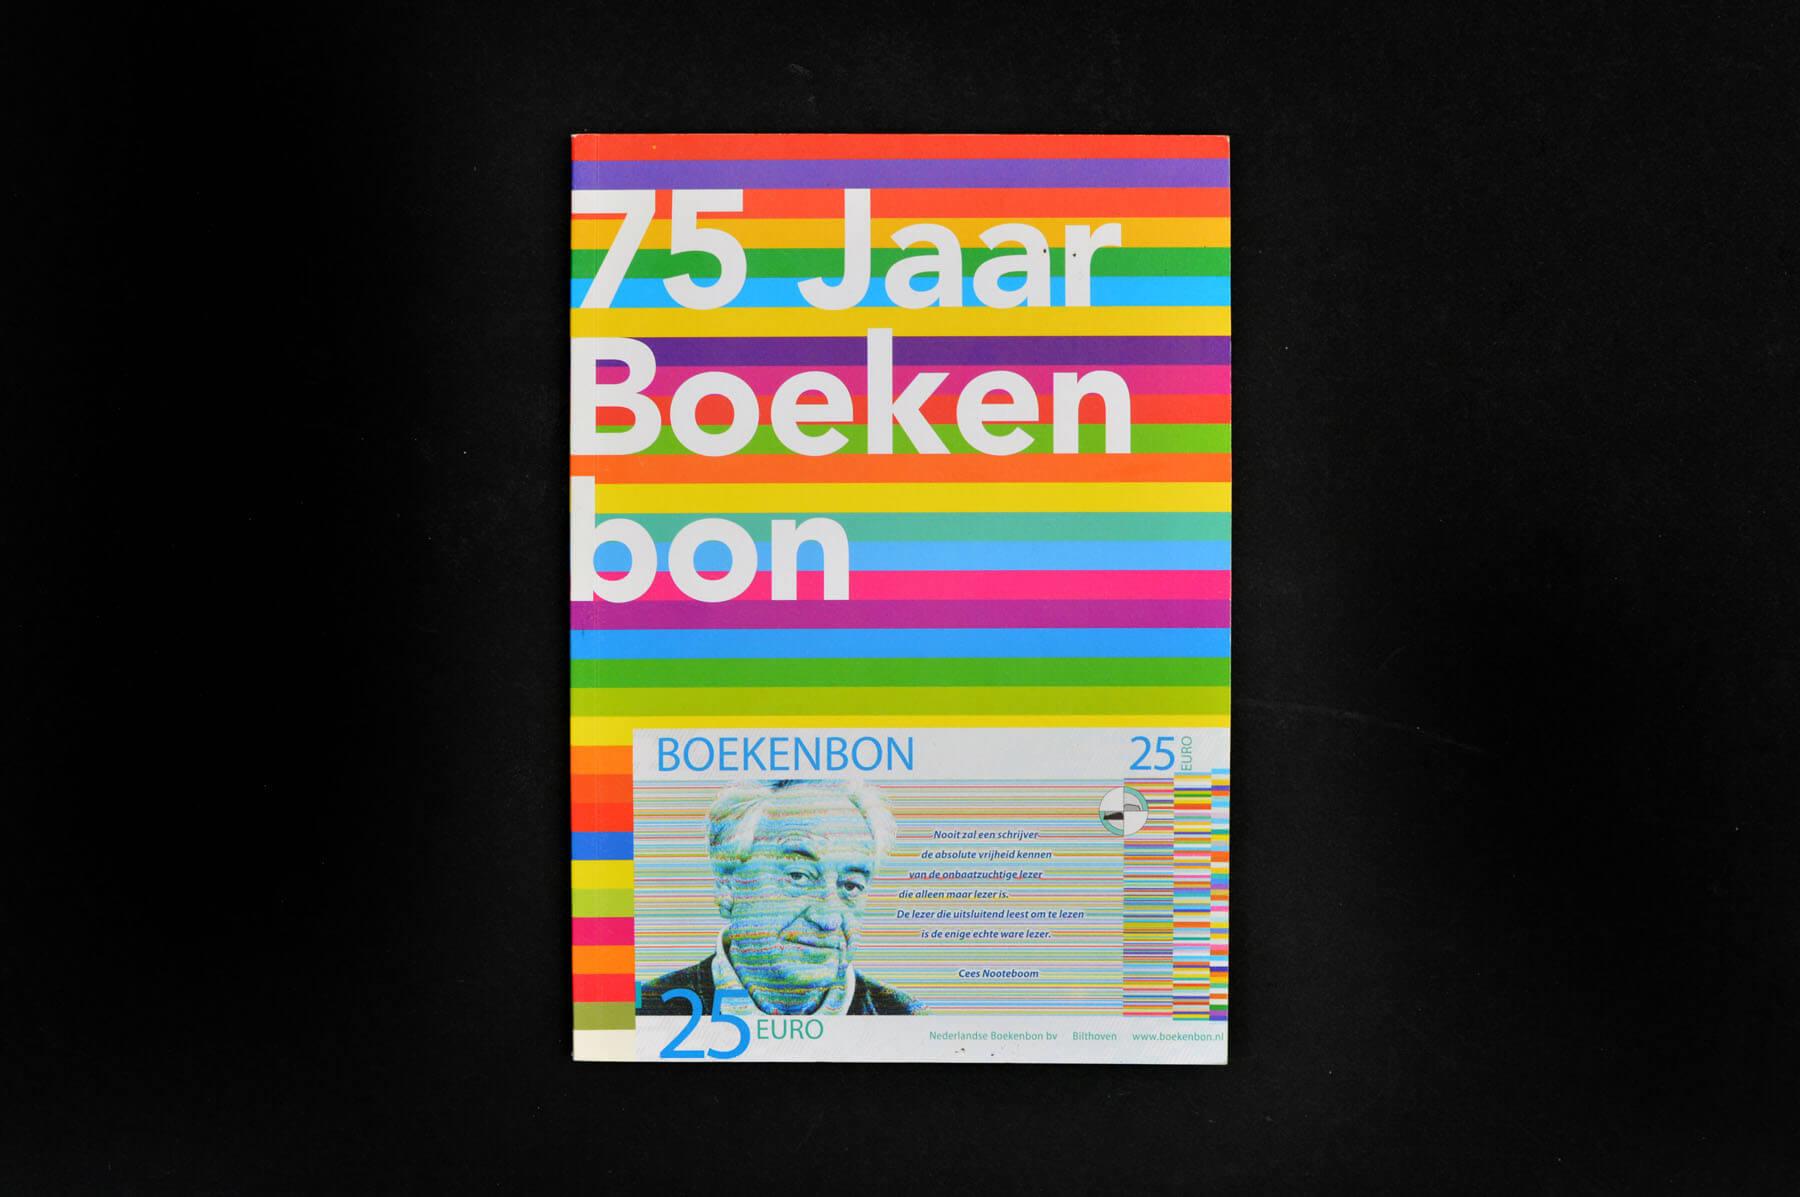 boekenbon isabel lucena01